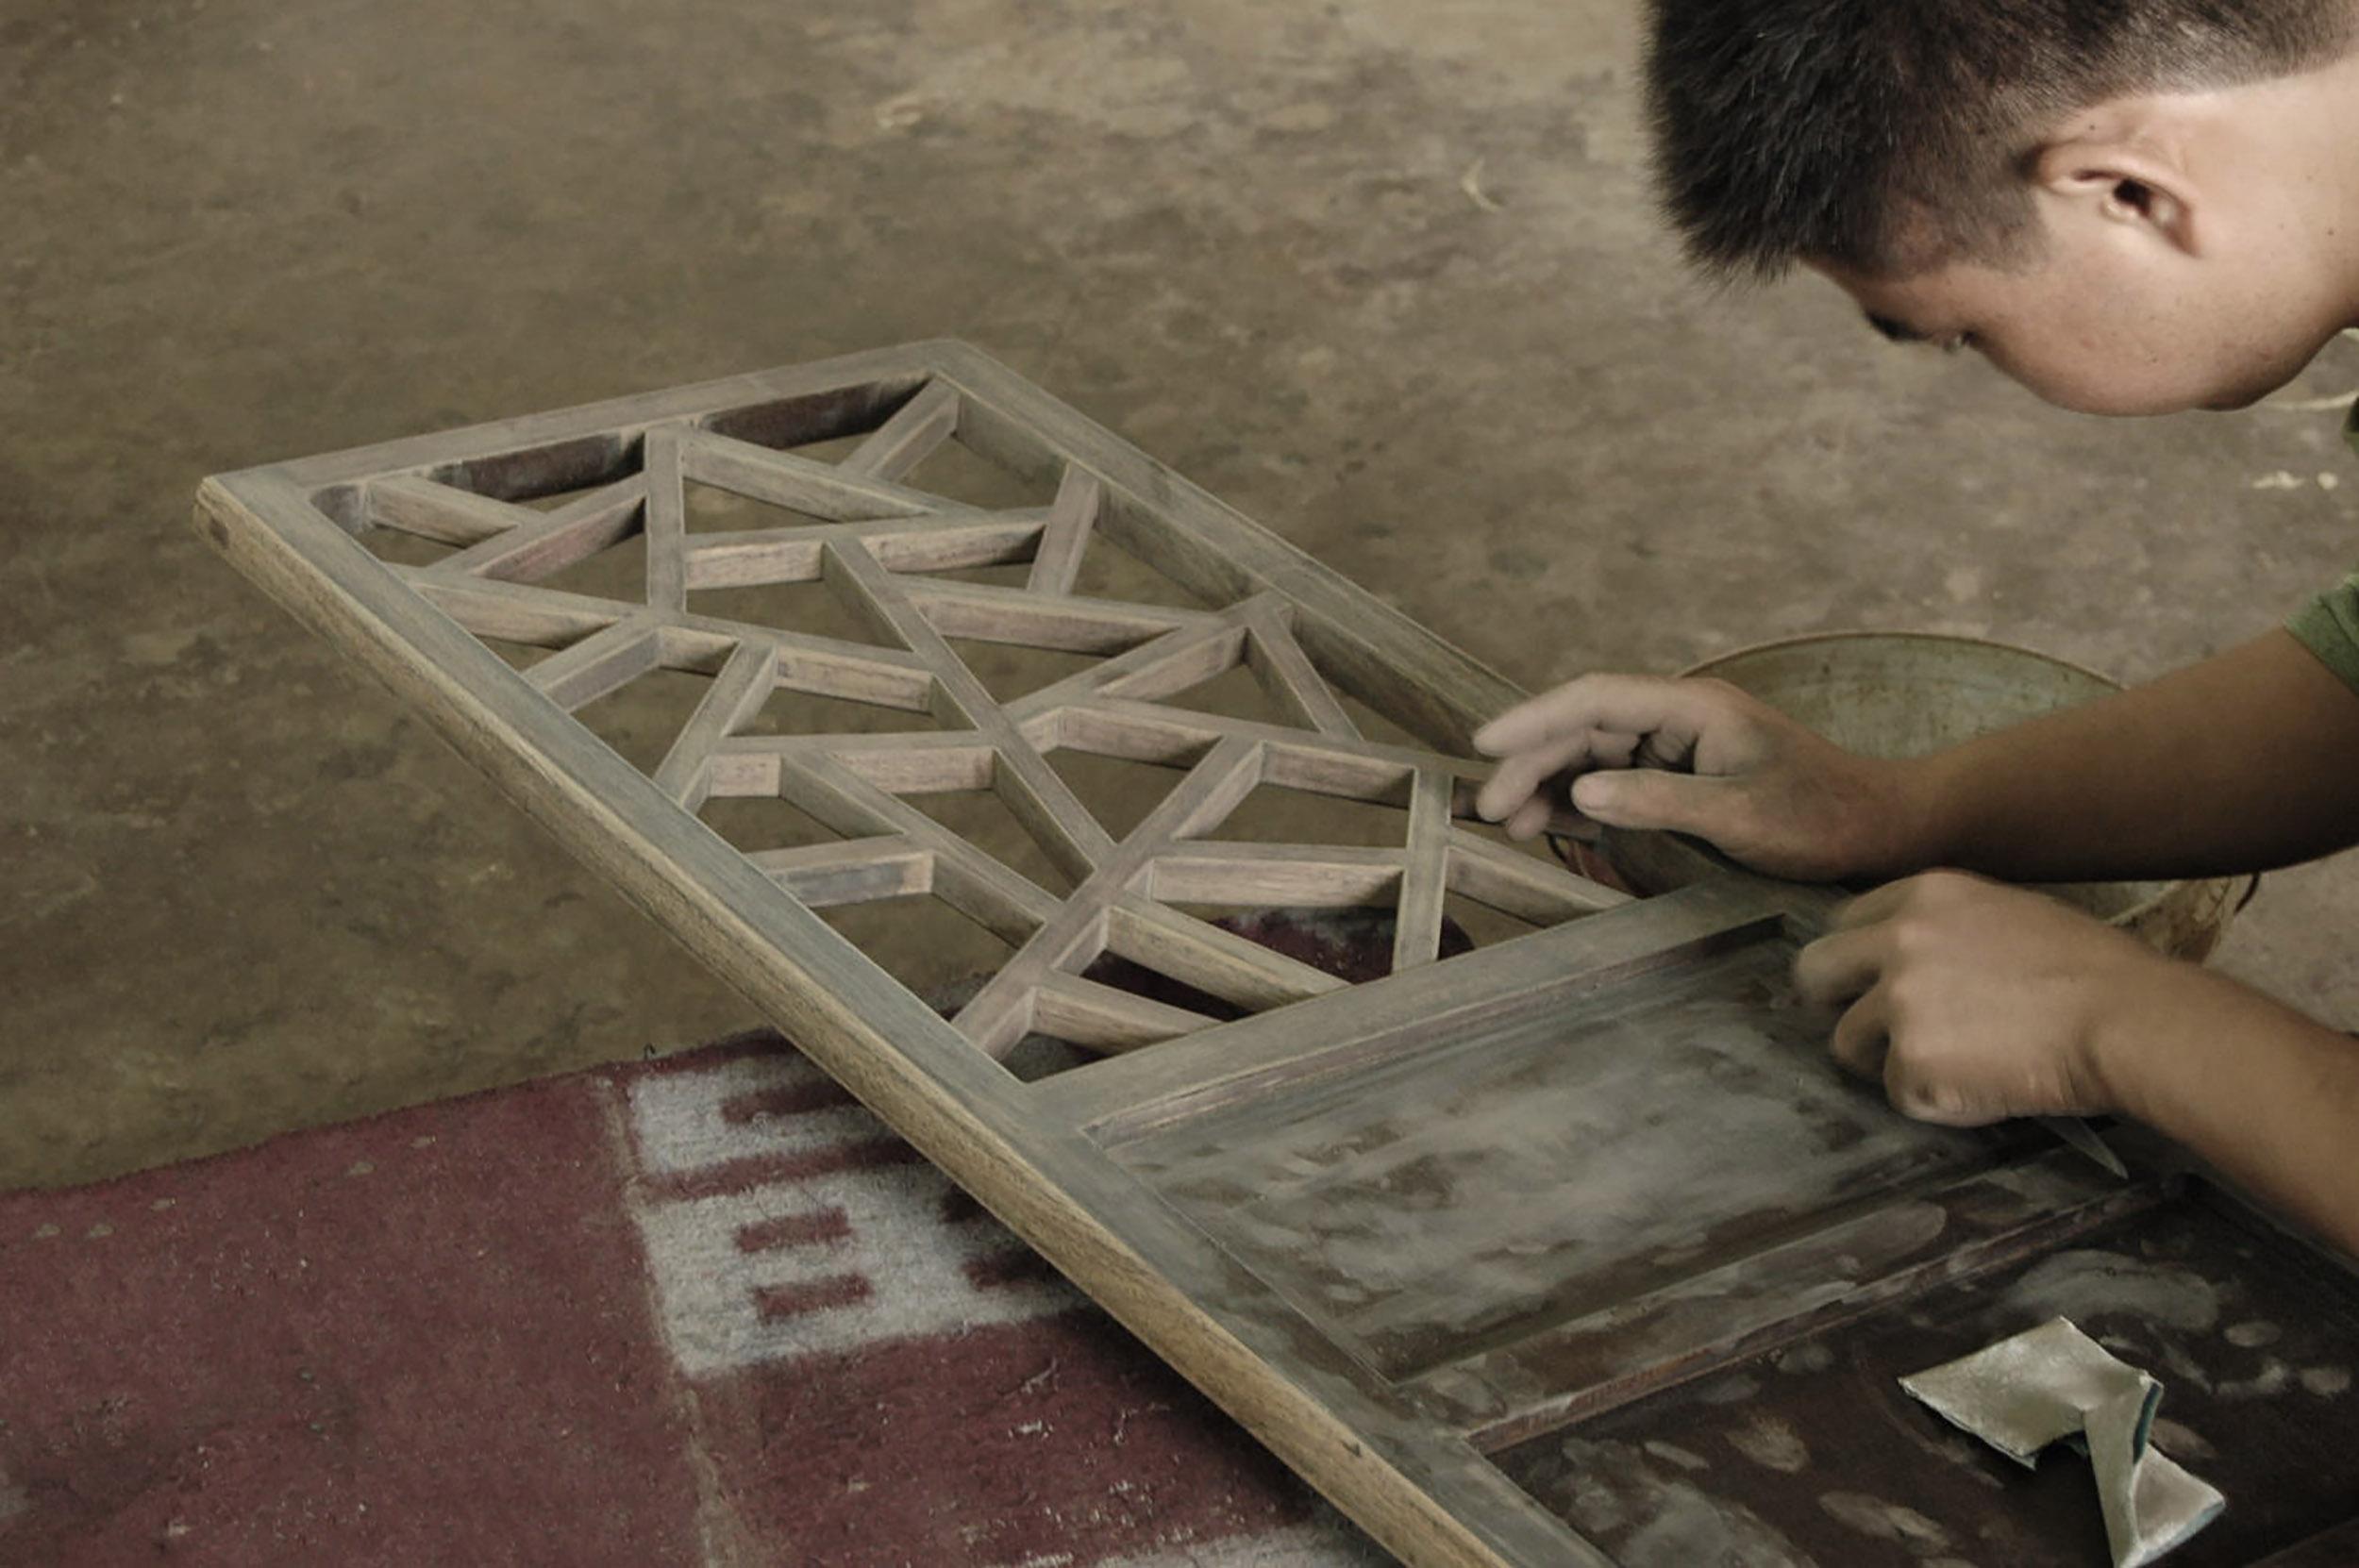 ....chinese ming style furniture | park hyatt washington : crafting photos..中式明式家具 | 华盛顿柏悦酒店 :制作照片....